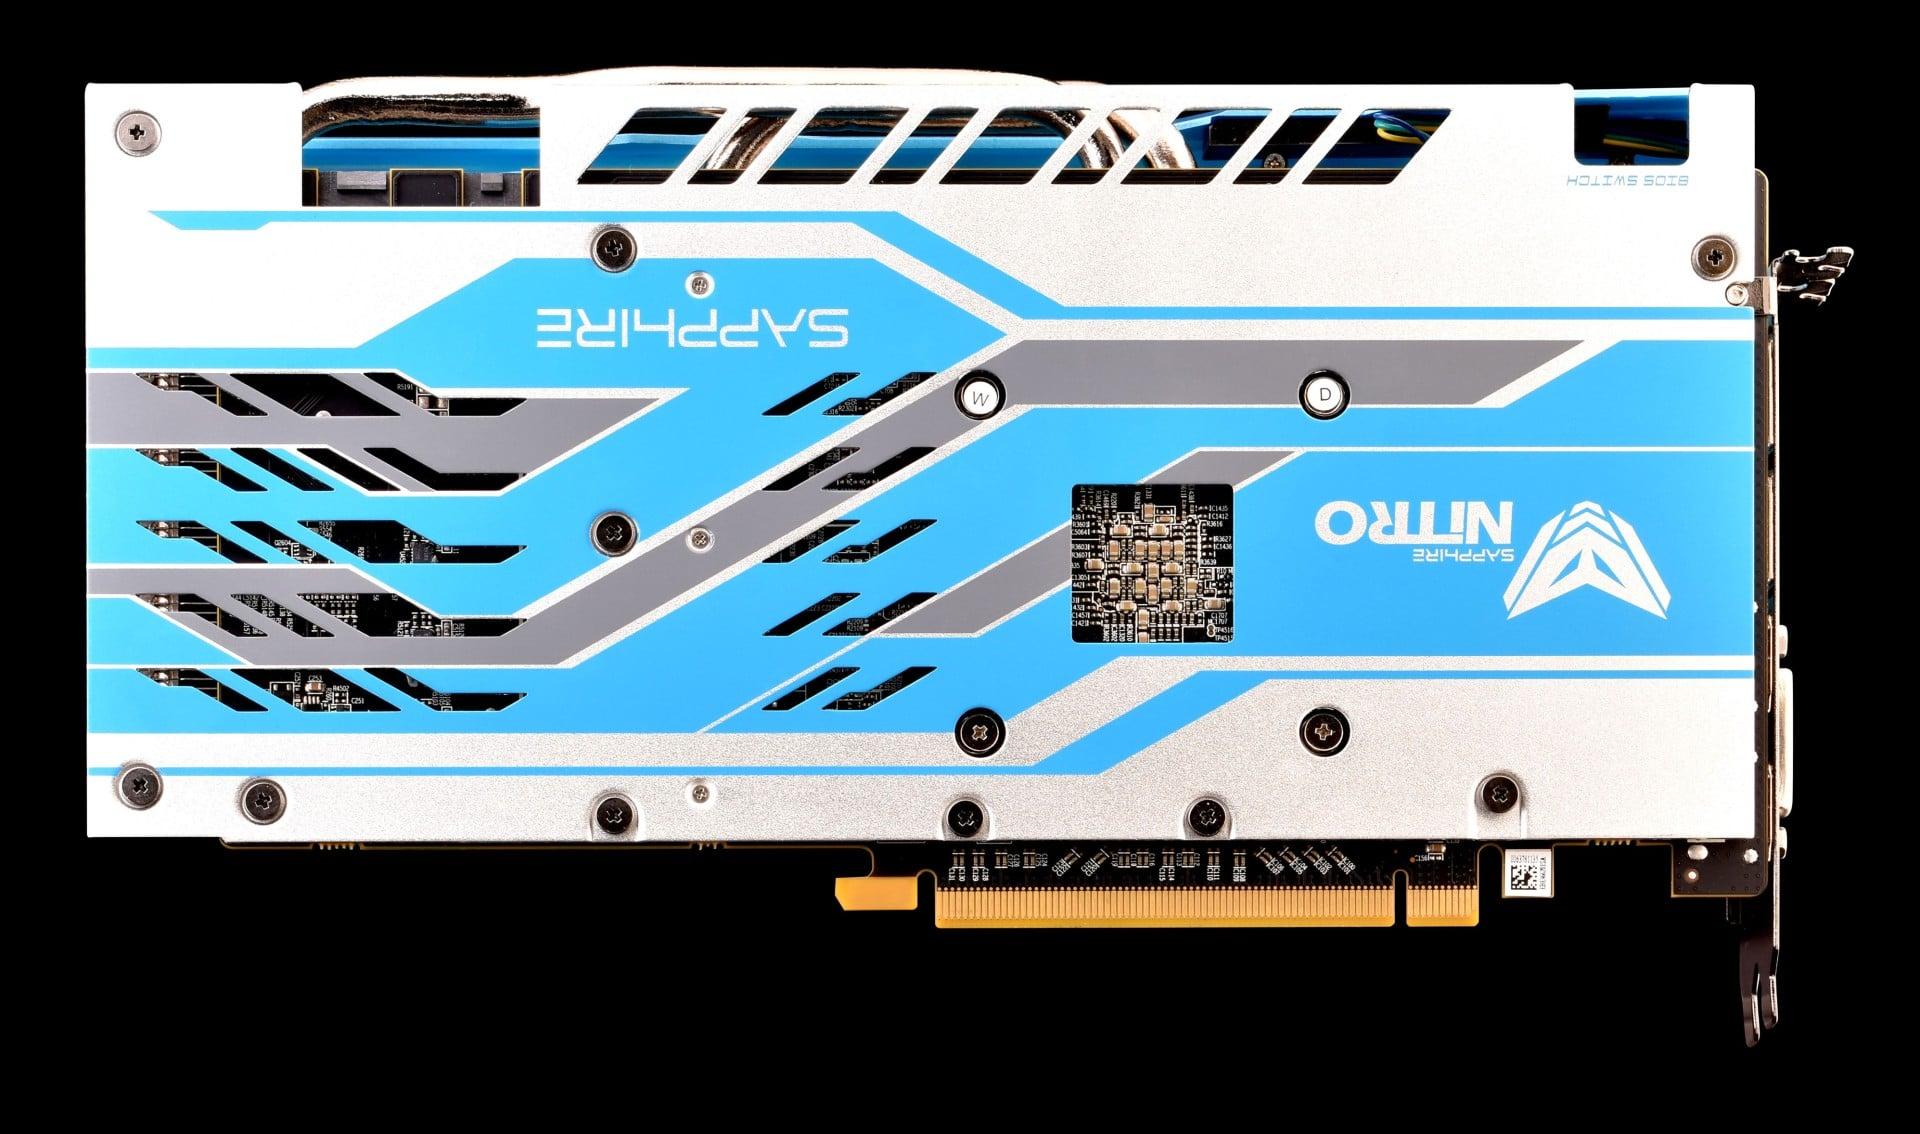 SAPPHIRE NITRO+ Radeon RX 590 8GB Special Edition